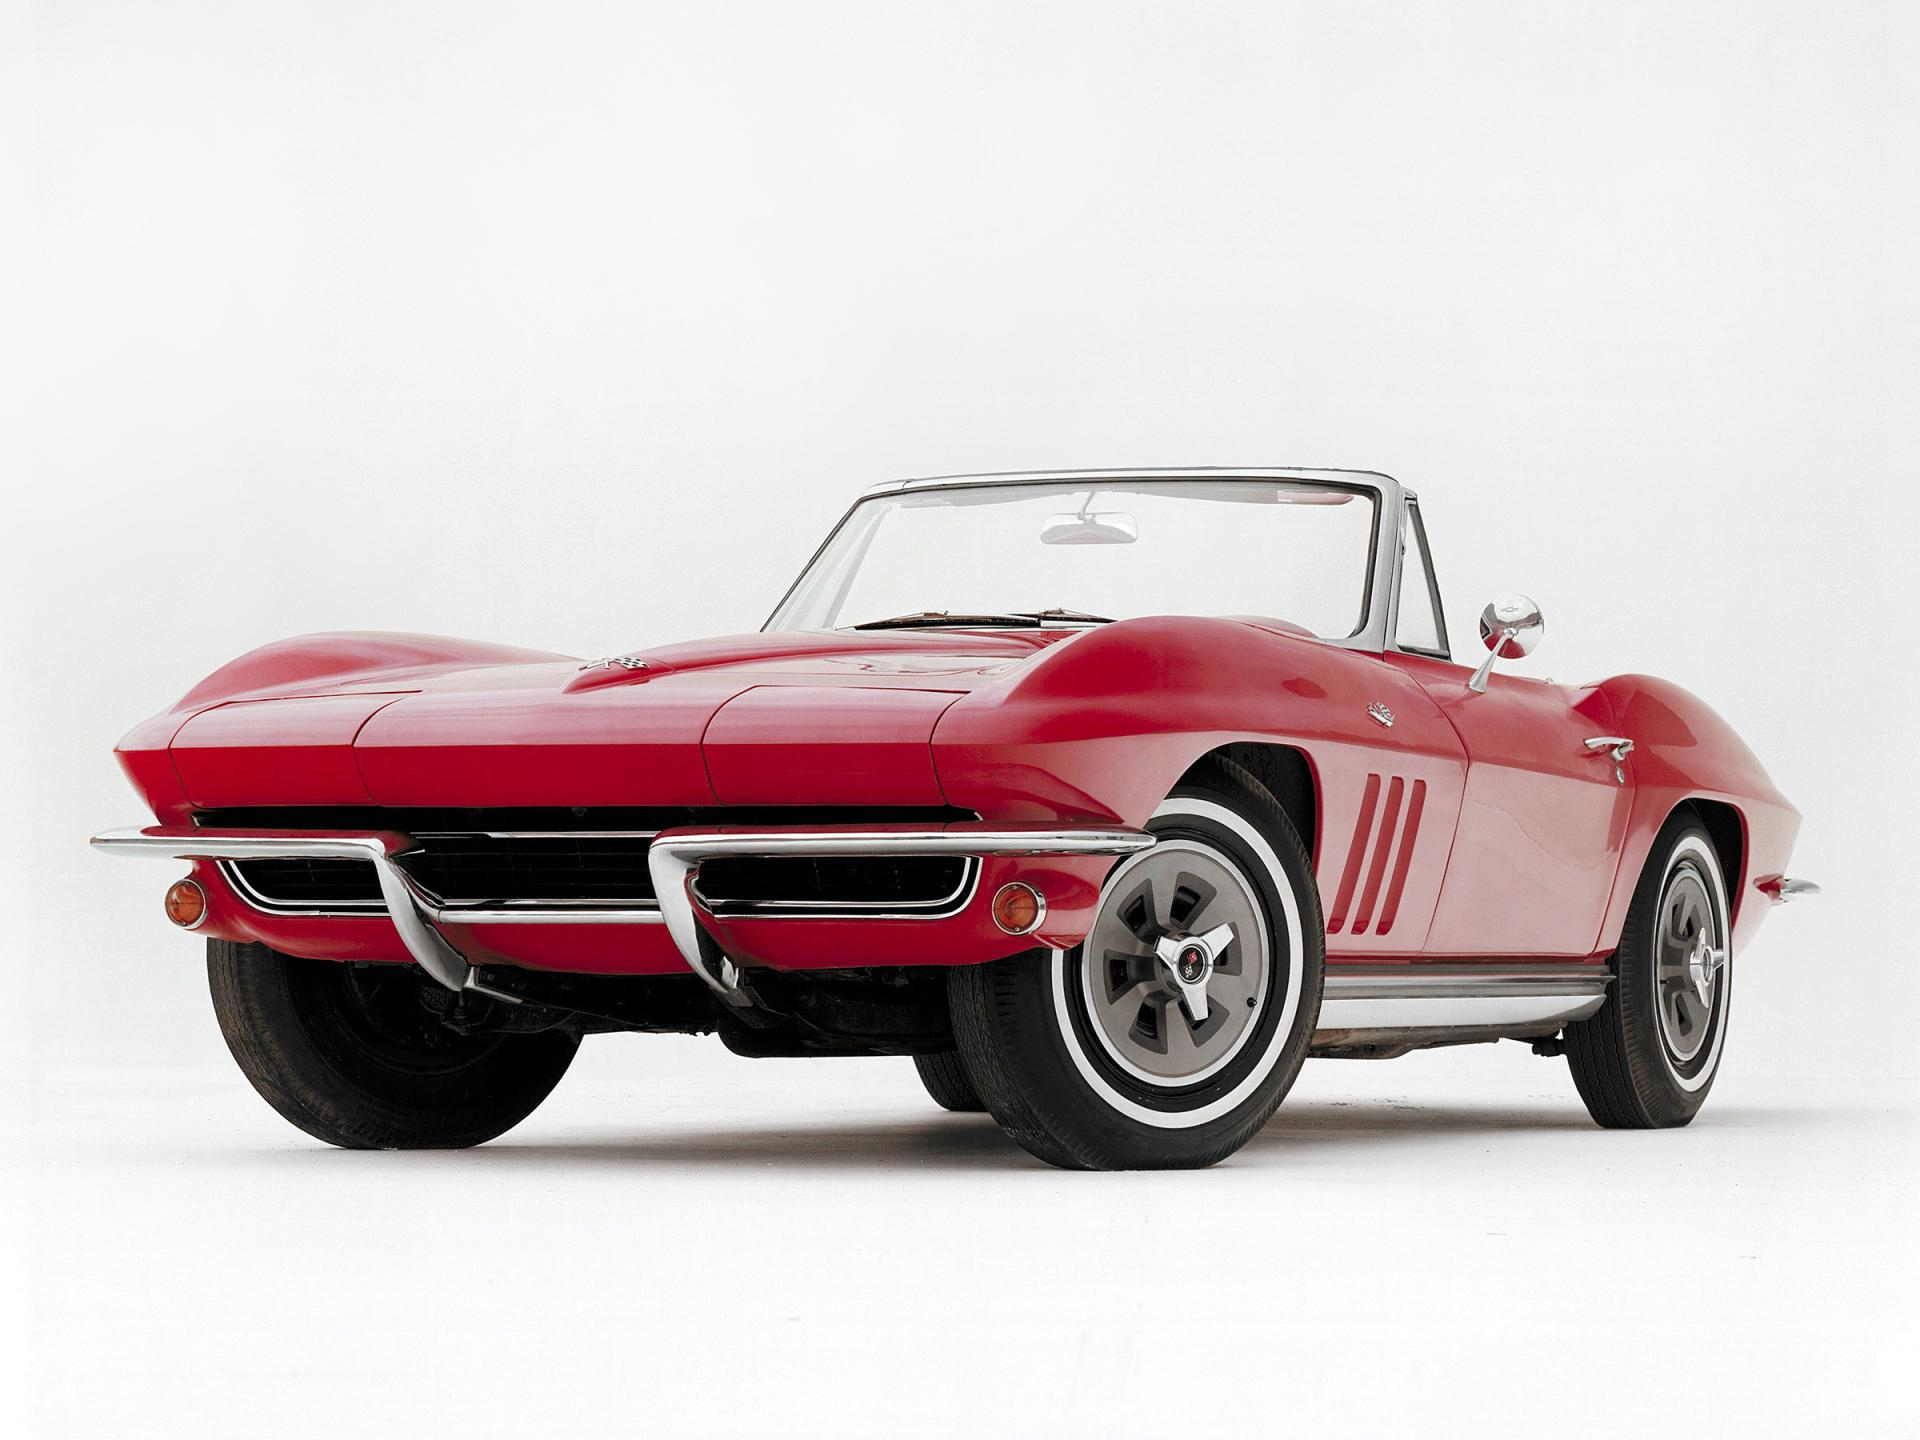 1965 corvette wallpaper - photo #33